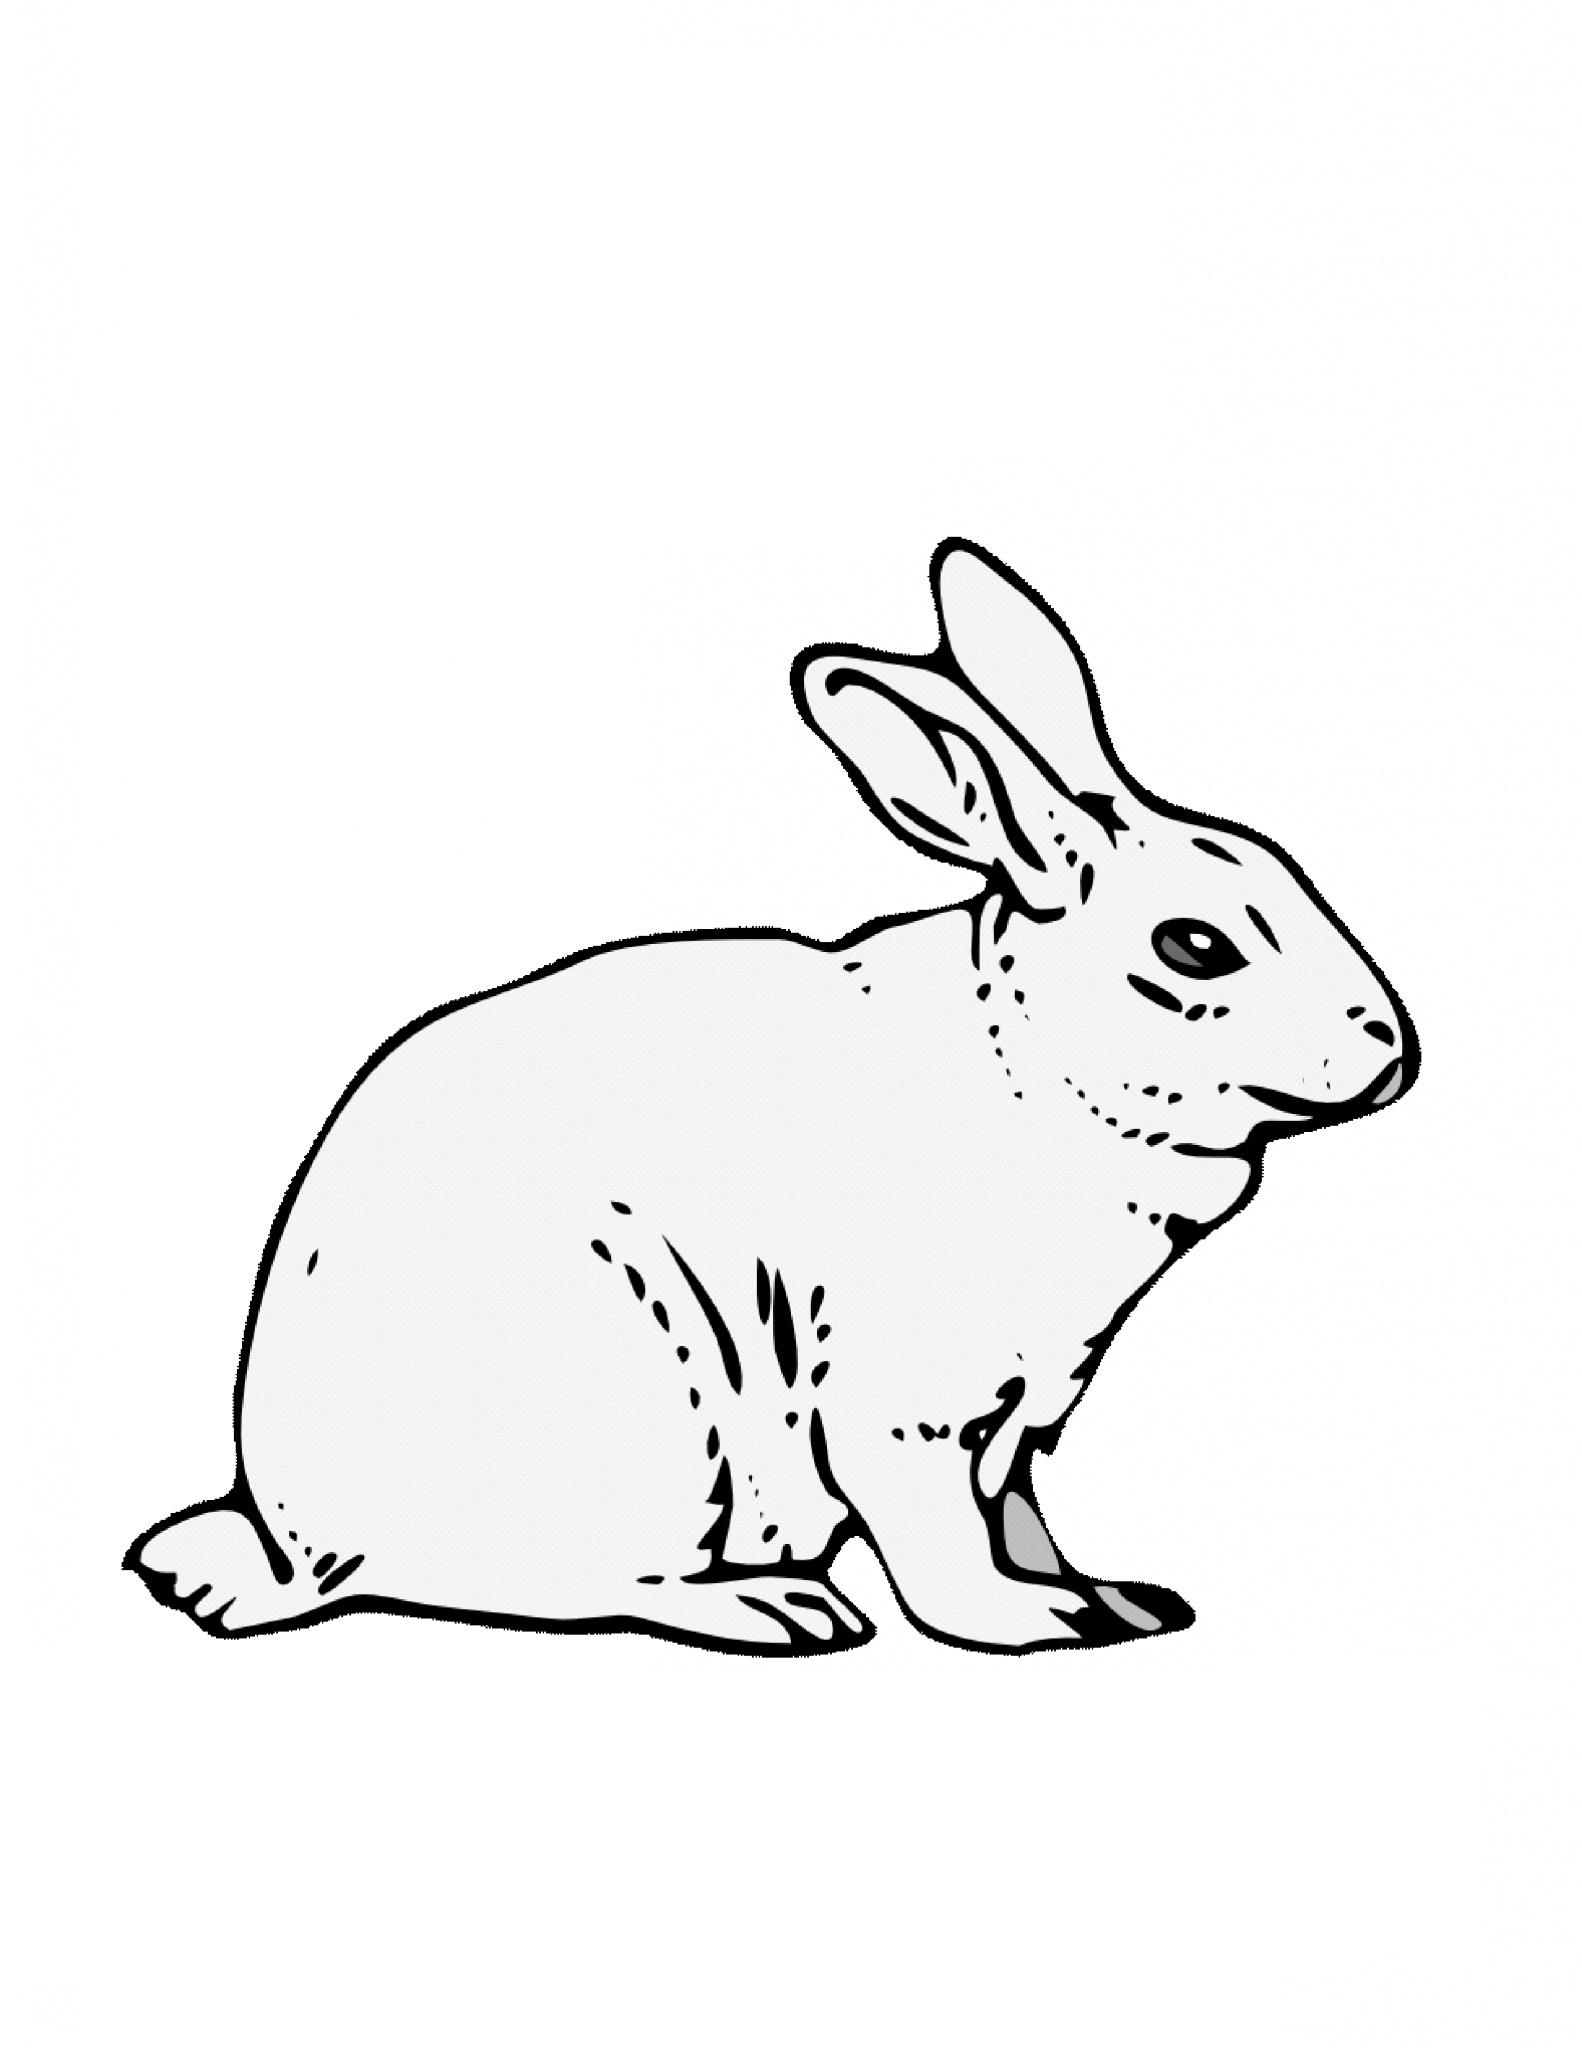 bunny rabbit printables free printable rabbit coloring pages for kids printables bunny rabbit